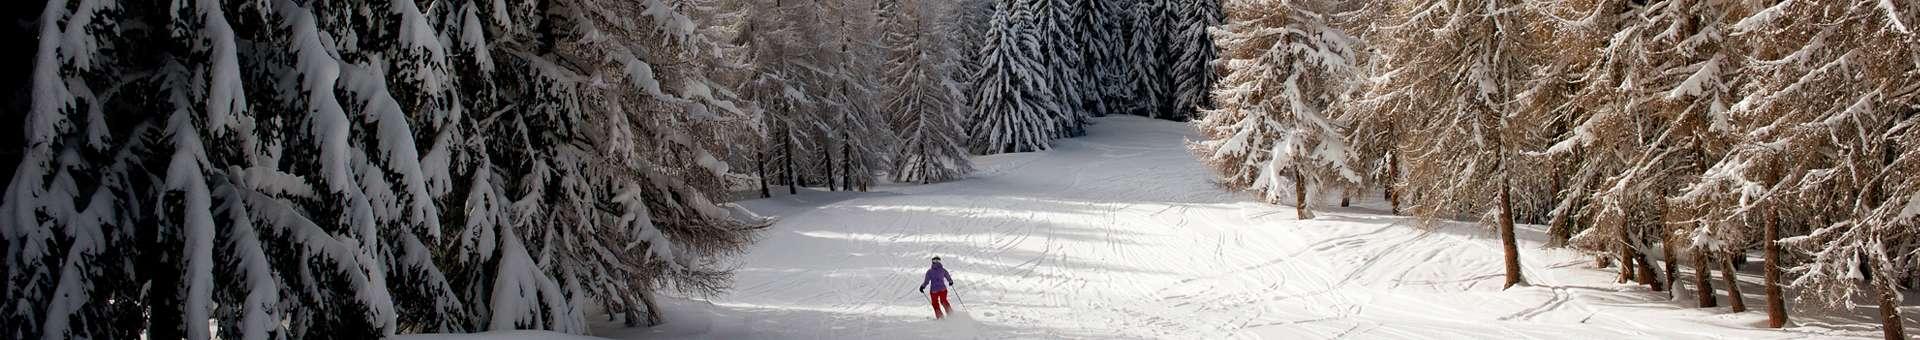 ski-6-1250